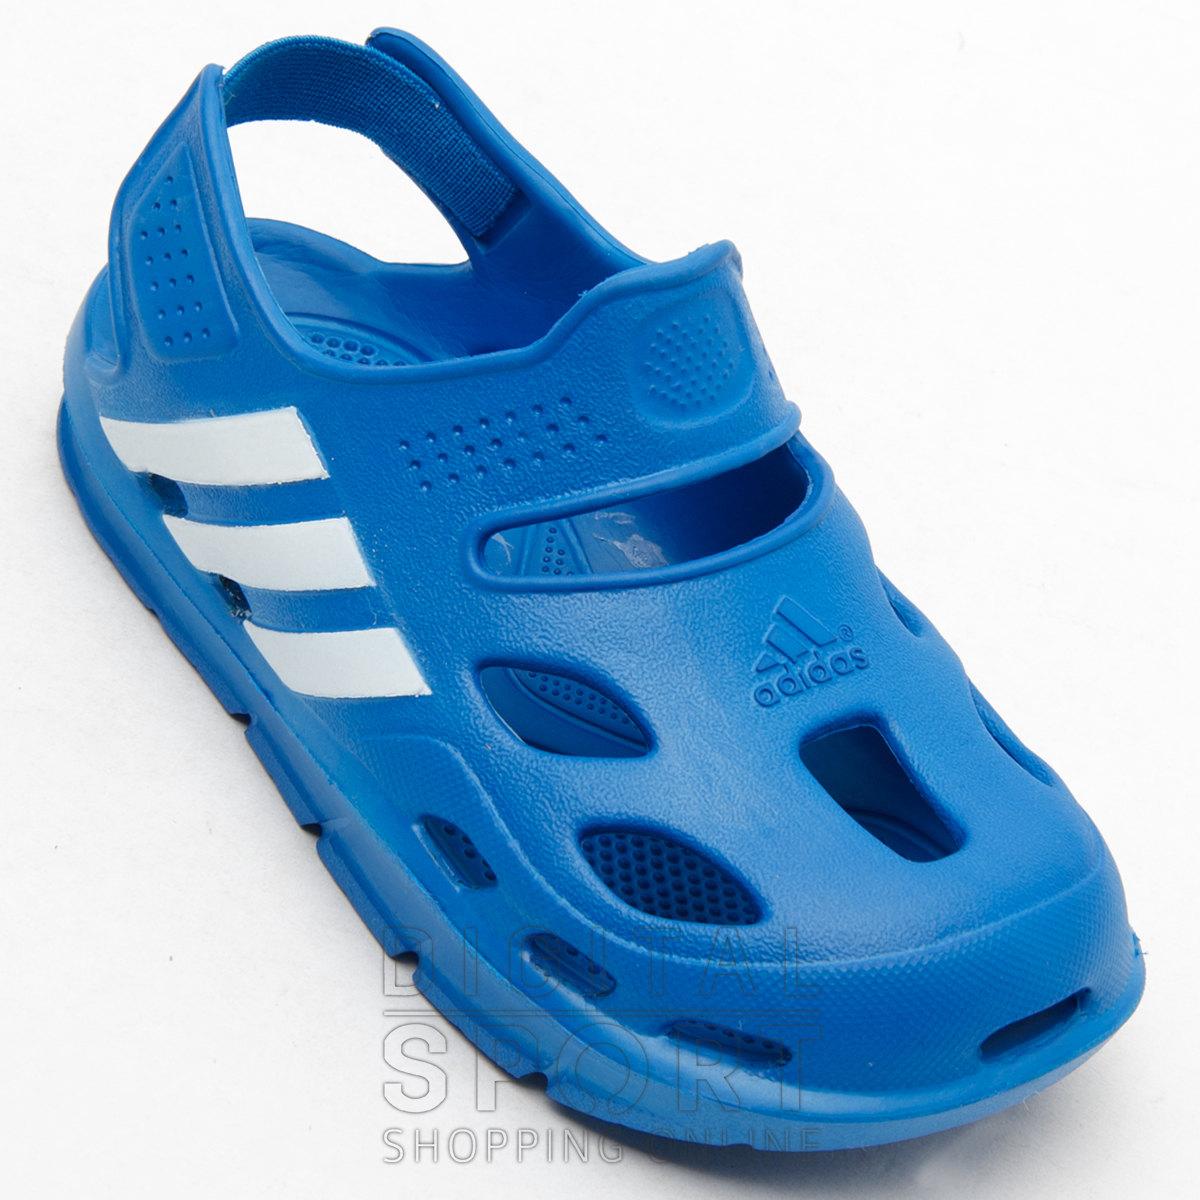 Sandalias Sandalias Adidas Varisol Juvenil Sandalias Adidas Sandalias Varisol Varisol Juvenil Juvenil Adidas 08nwONmv